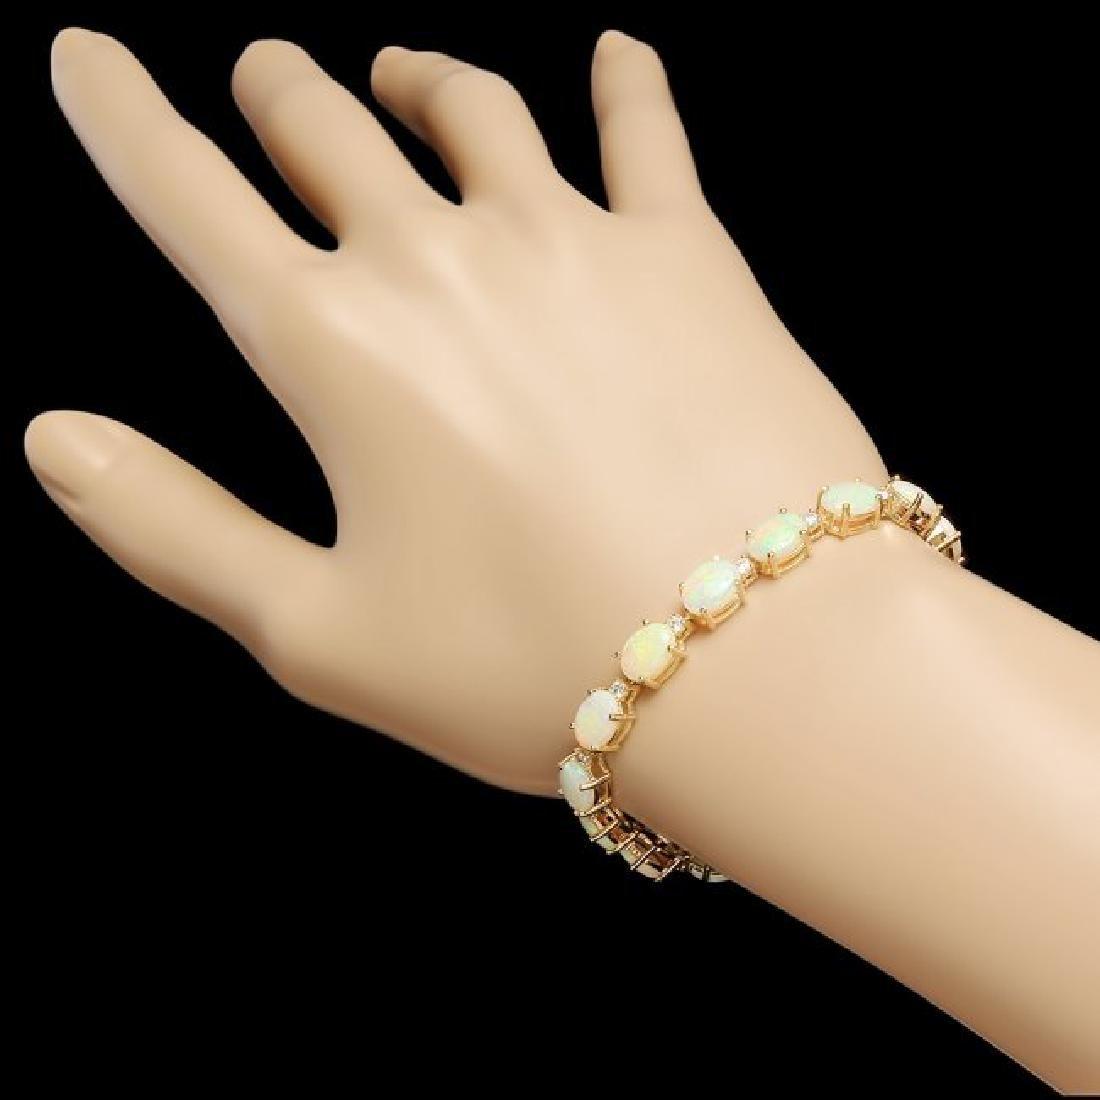 14k Gold 15.00ct Opal 0.75ct Diamond Bracelet - 3